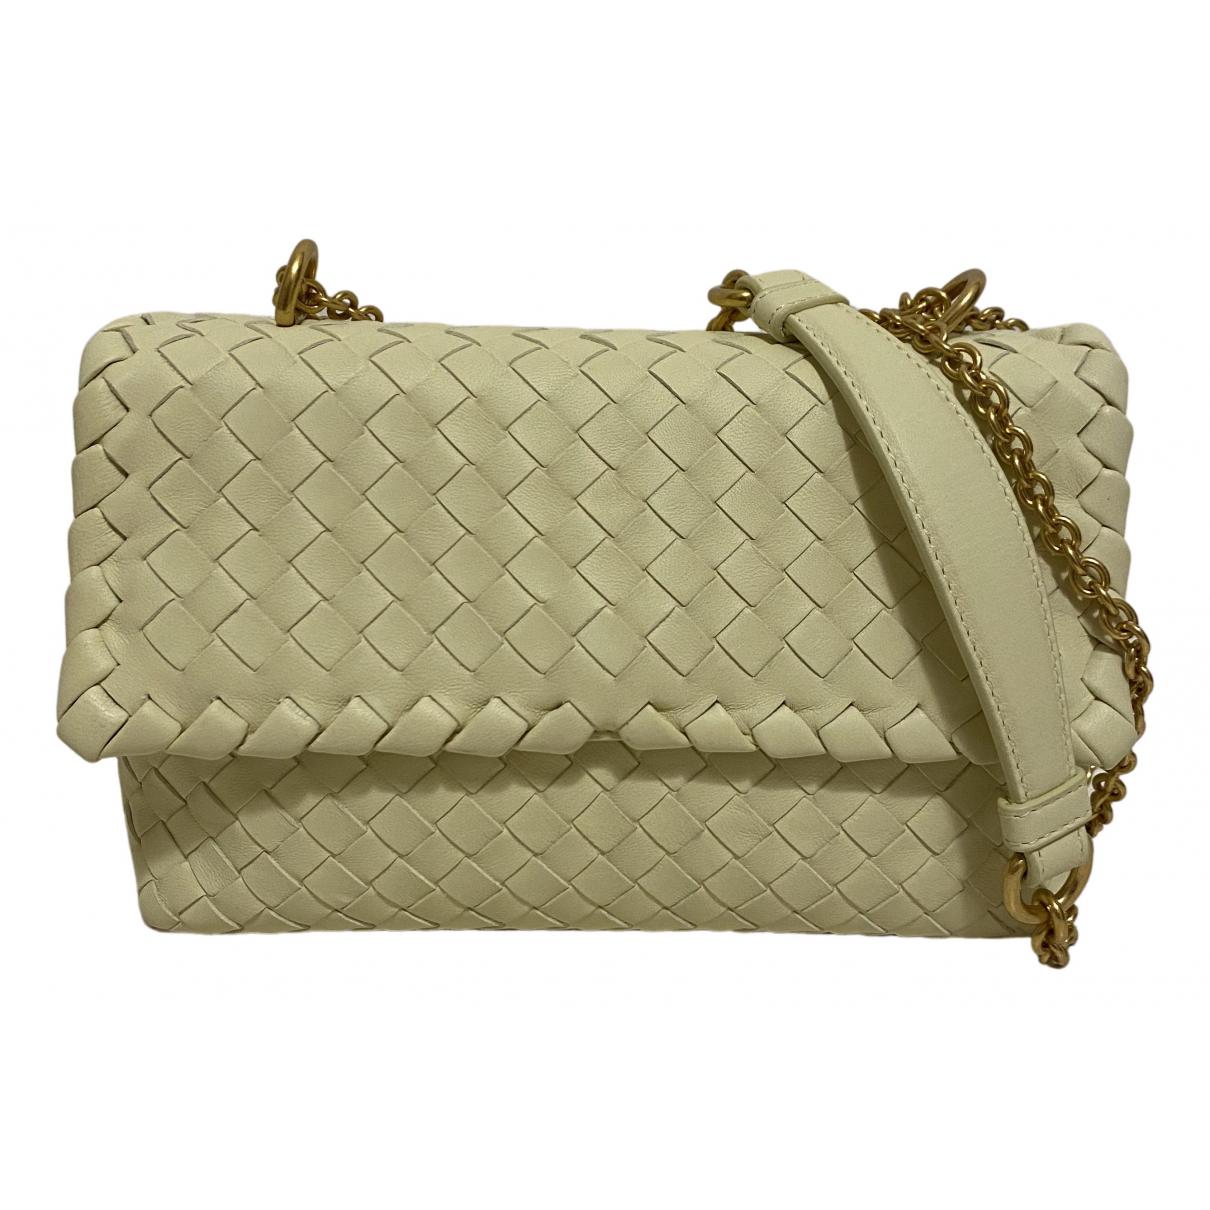 Bottega Veneta Olimpia Yellow Leather handbag for Women N